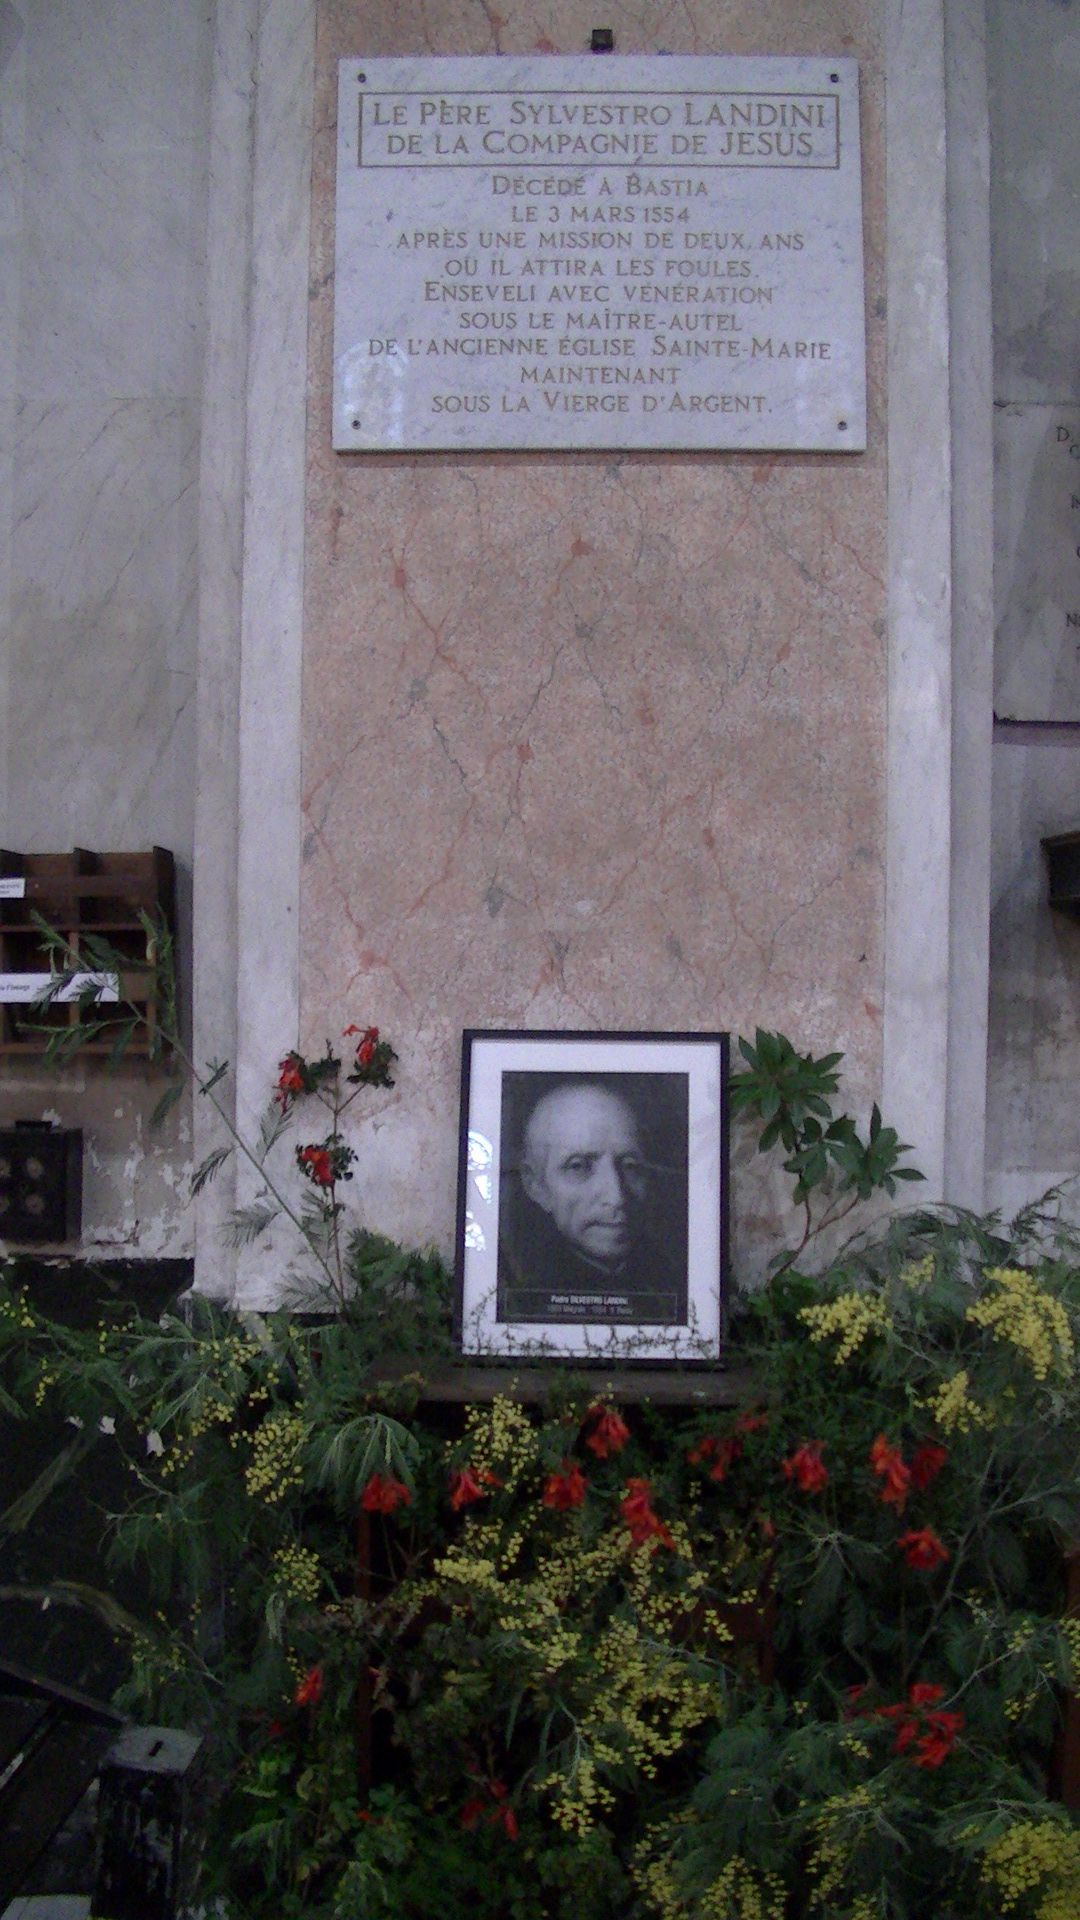 Santu Subitu : le jésuite Padre Silvestro Landini honoré à Bastia